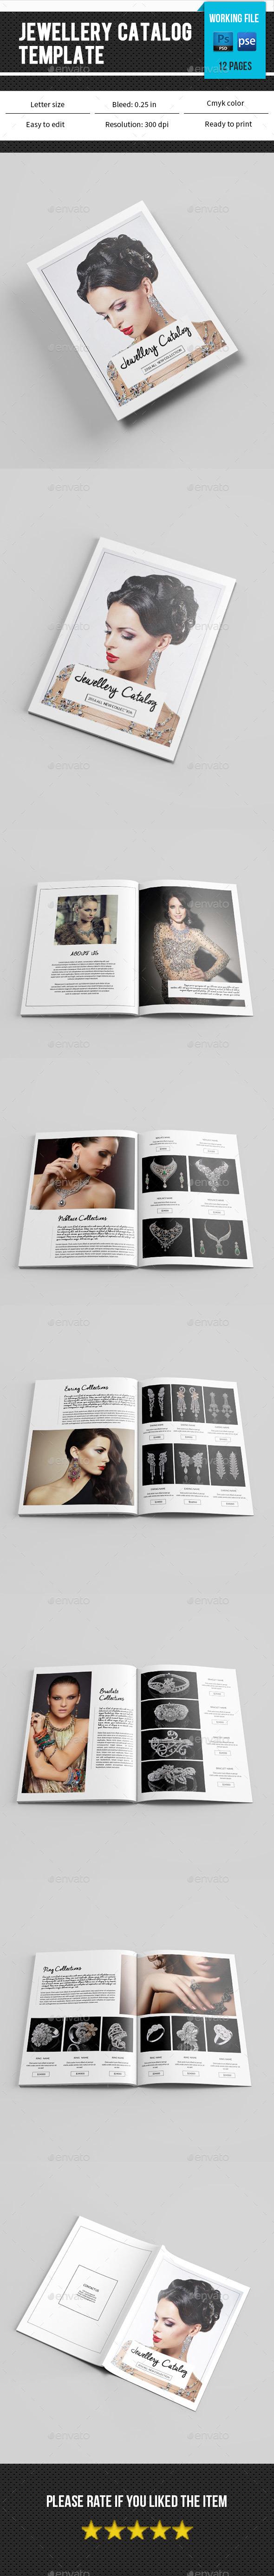 Jewellery Catalog V10 - Catalogs Brochures